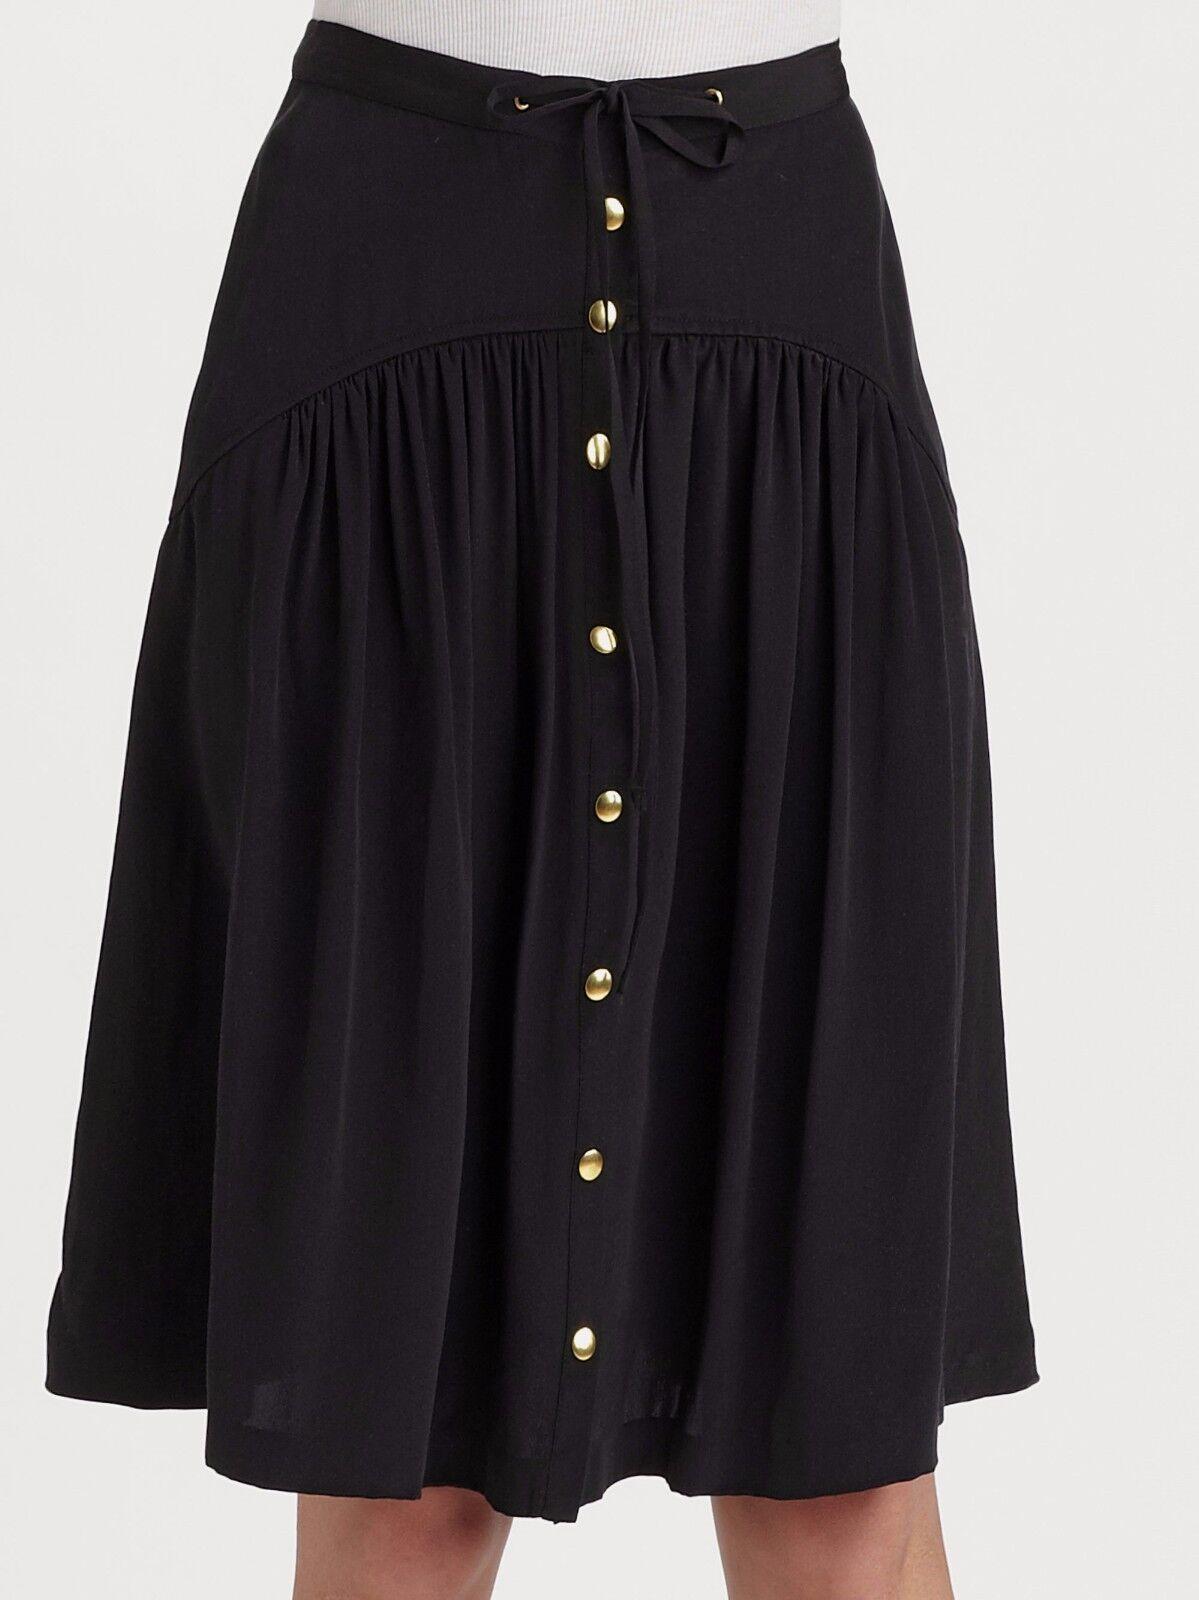 New Leifsdottir A-Line Silk Crepe Skirt Sz 02